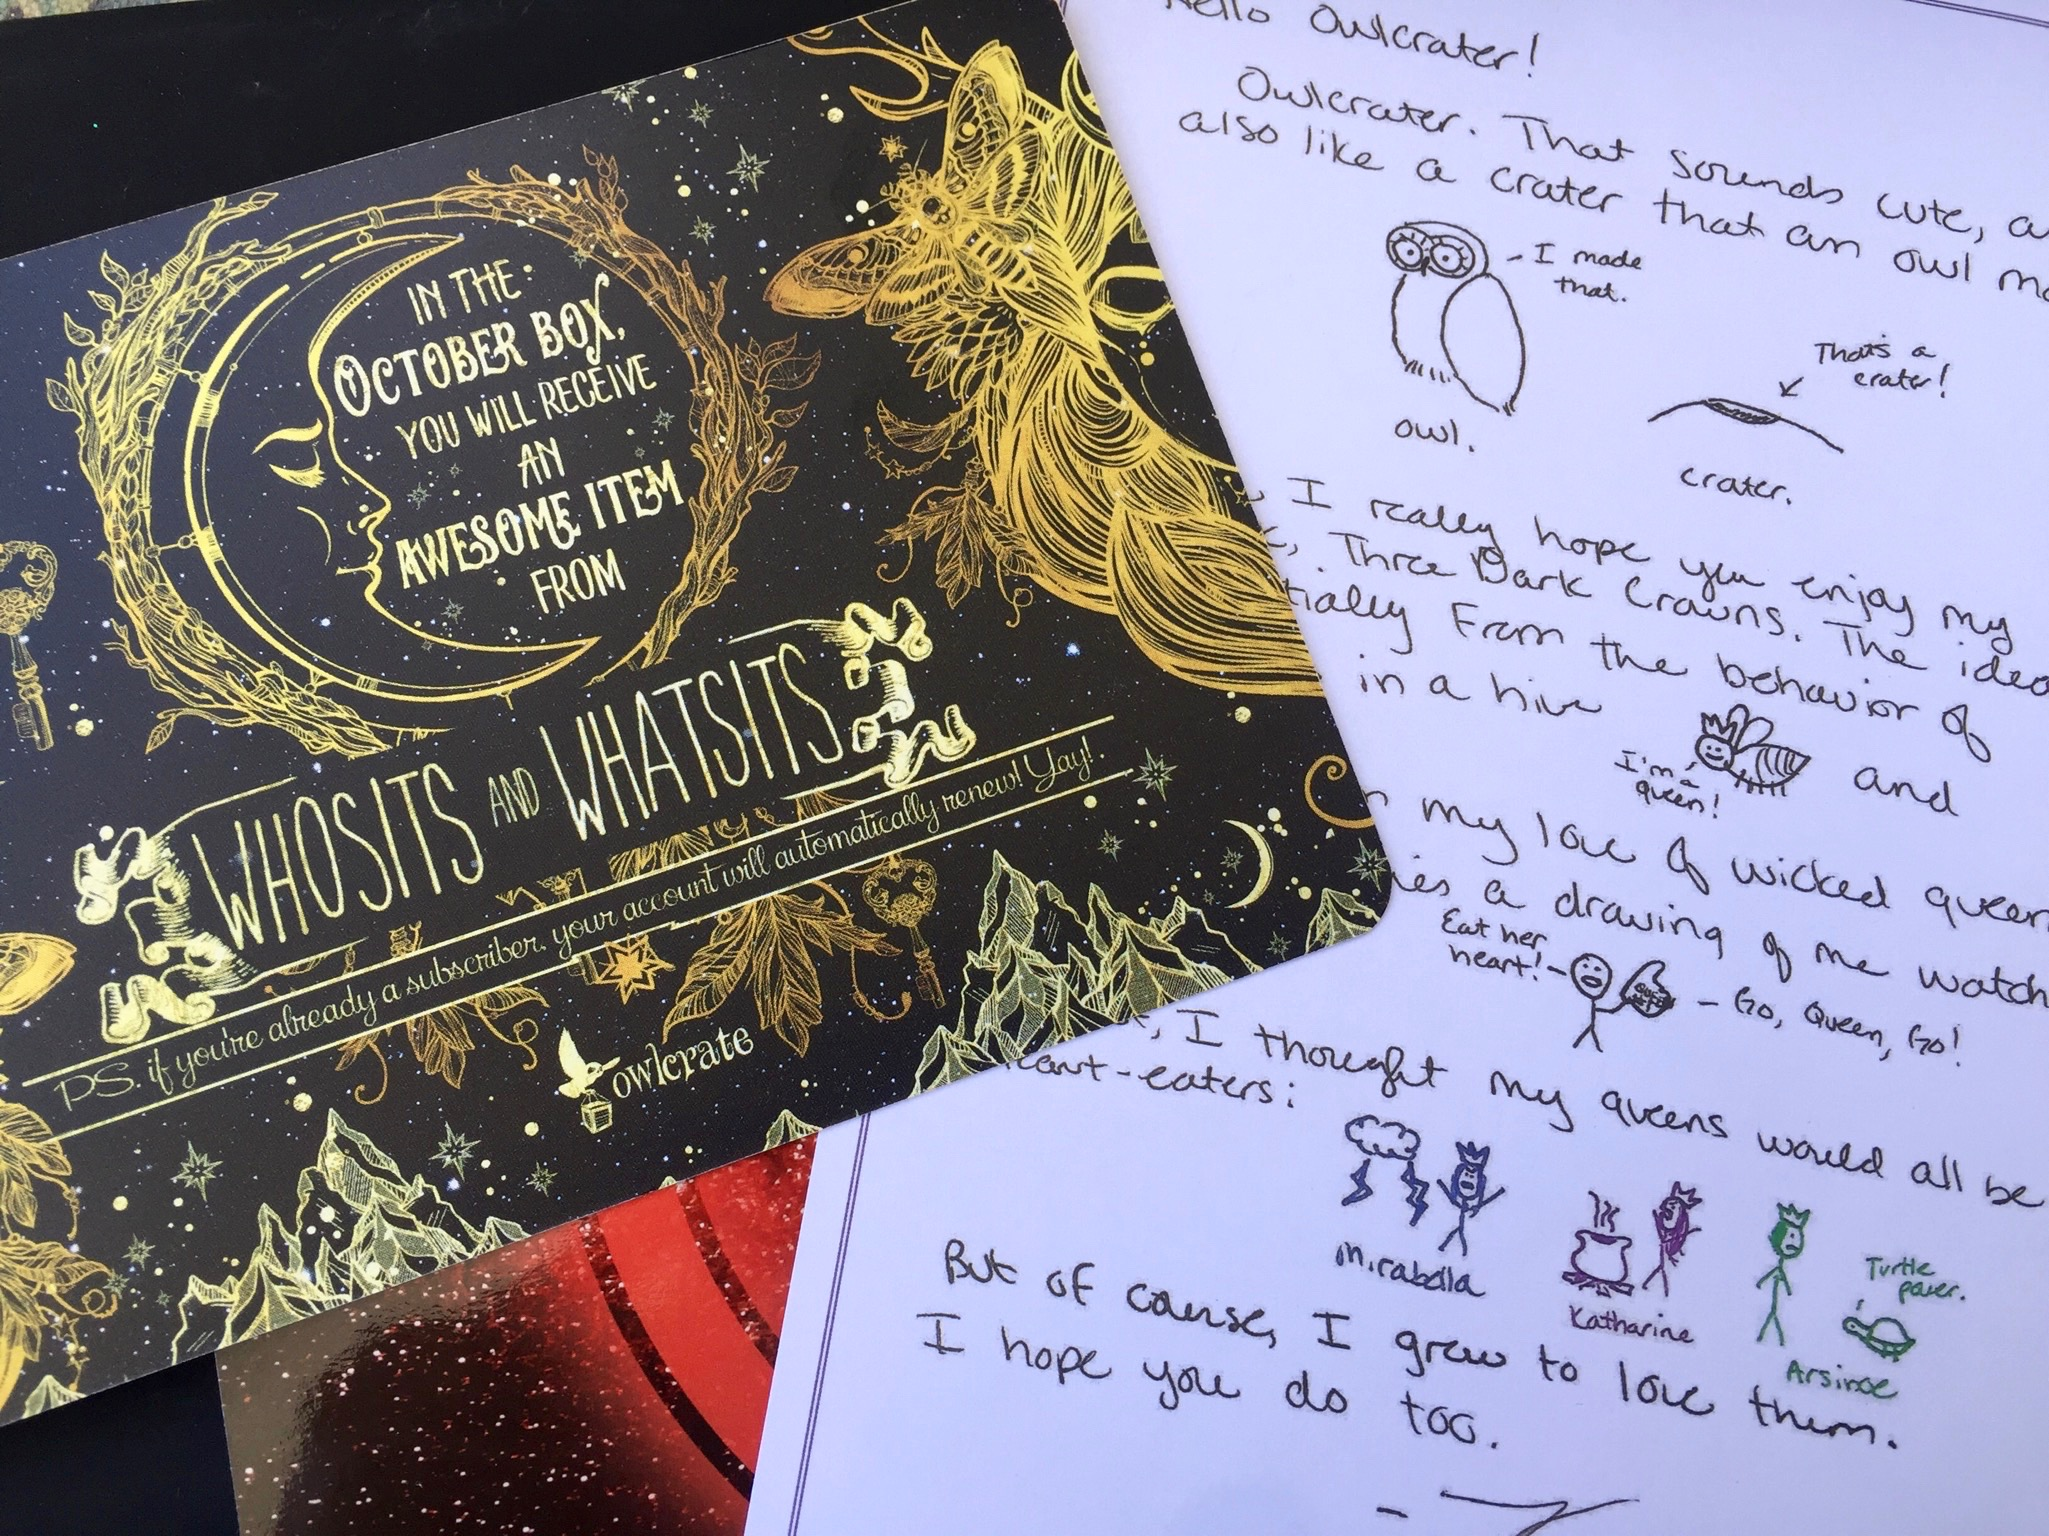 Illustrations - September Owlcrate